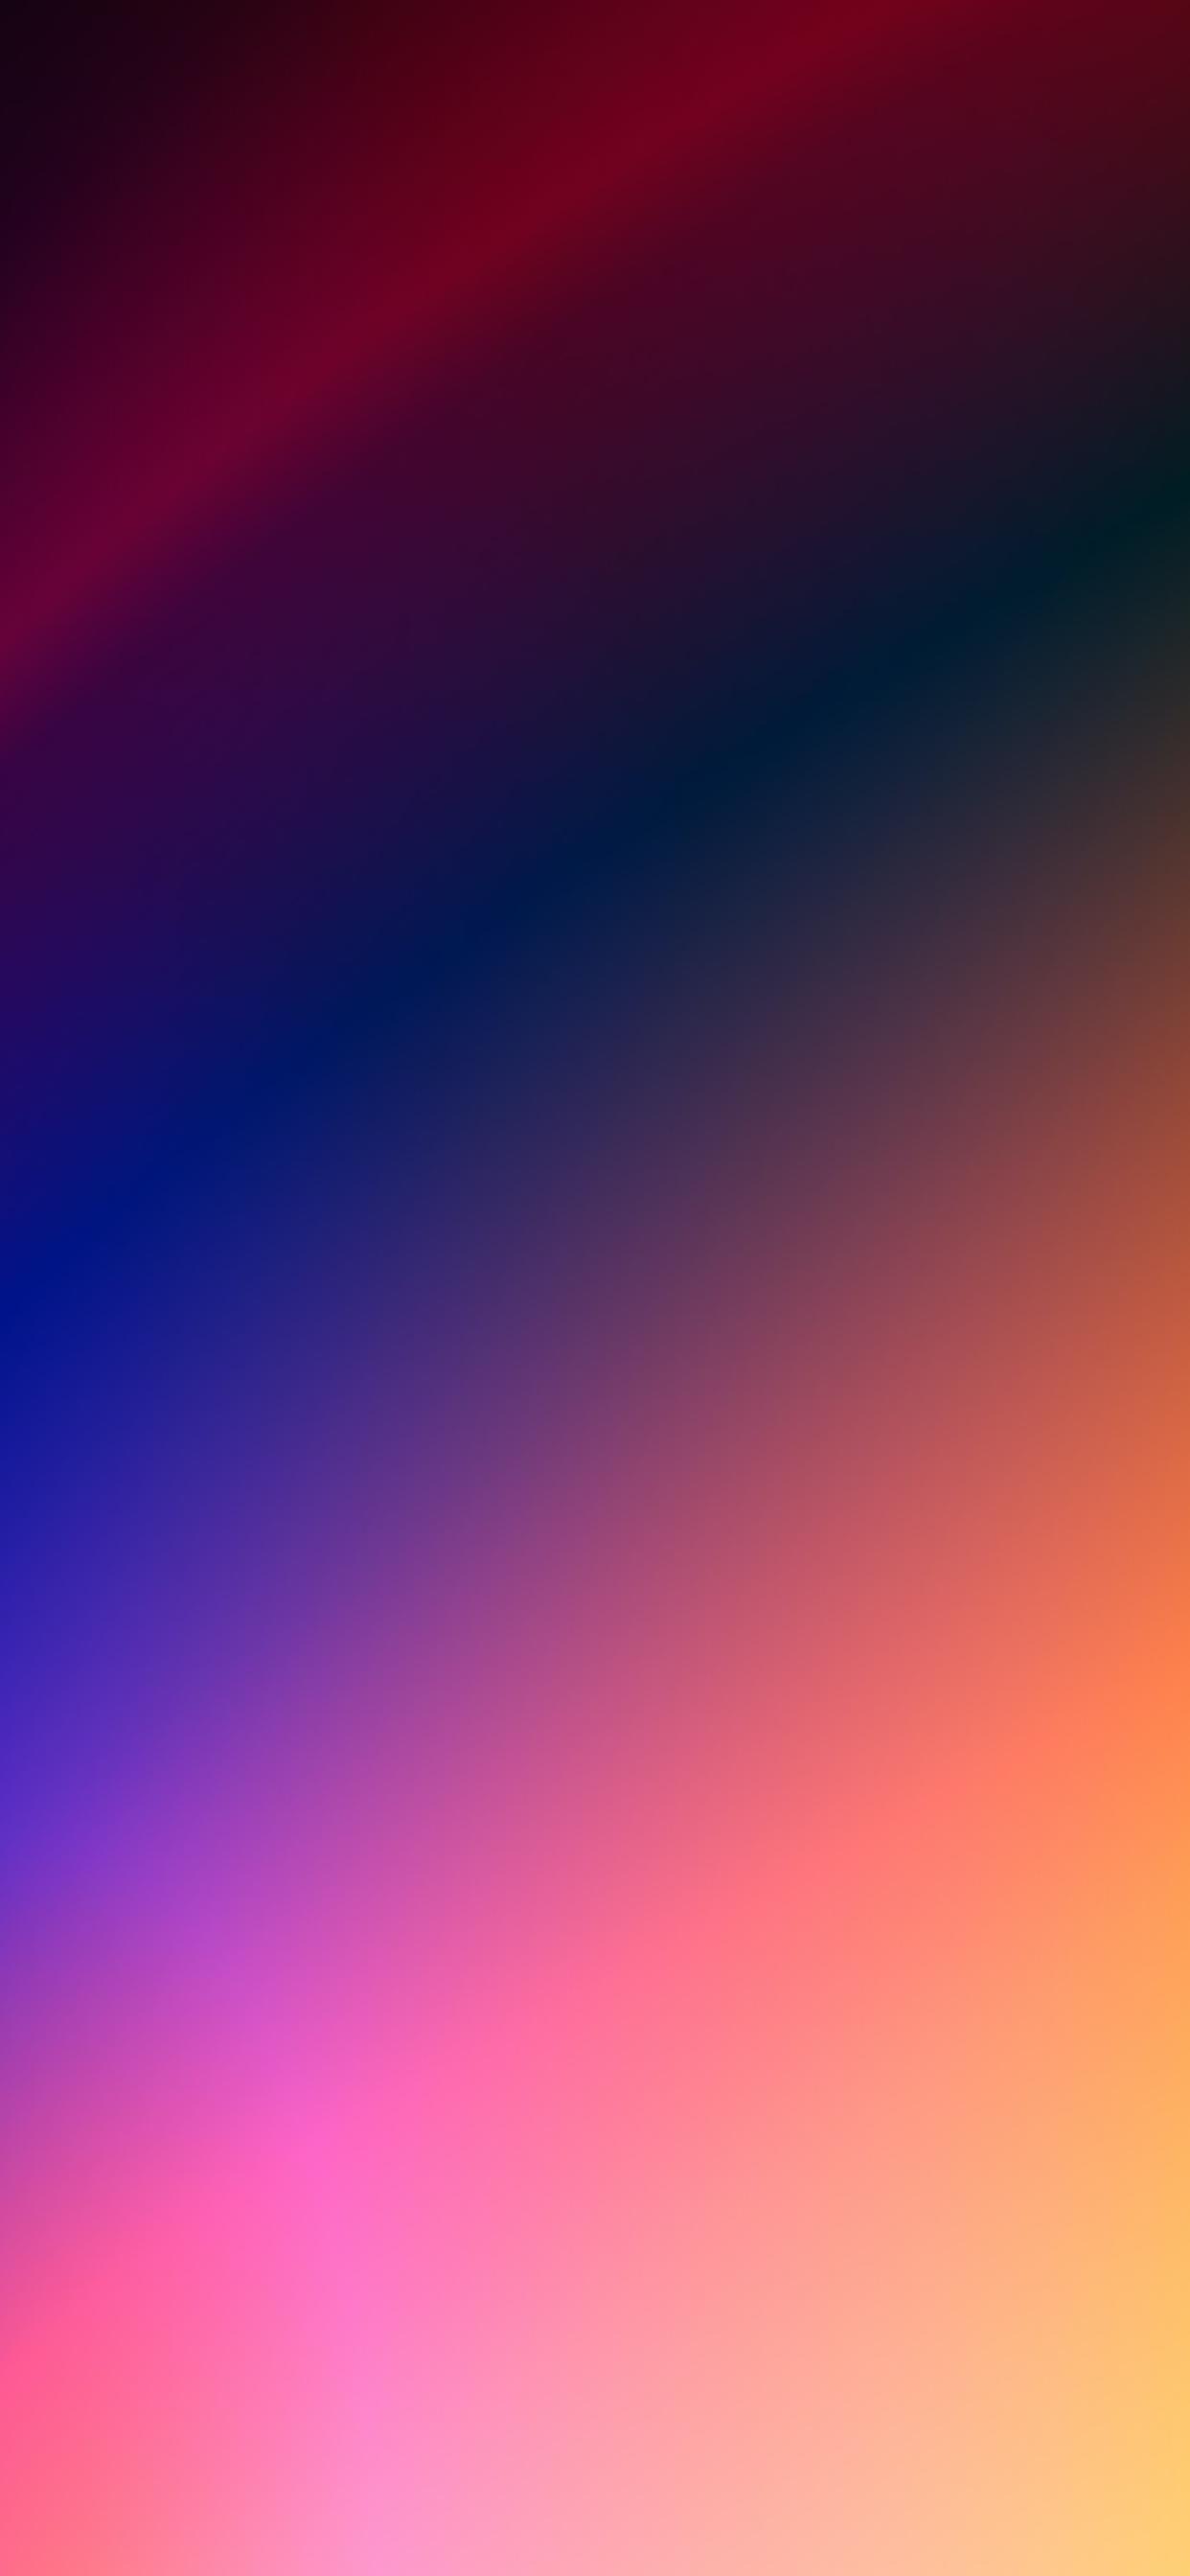 iPhone wallpapers gradient colors blue pink green Fonds d'écran iPhone du 27/05/2020